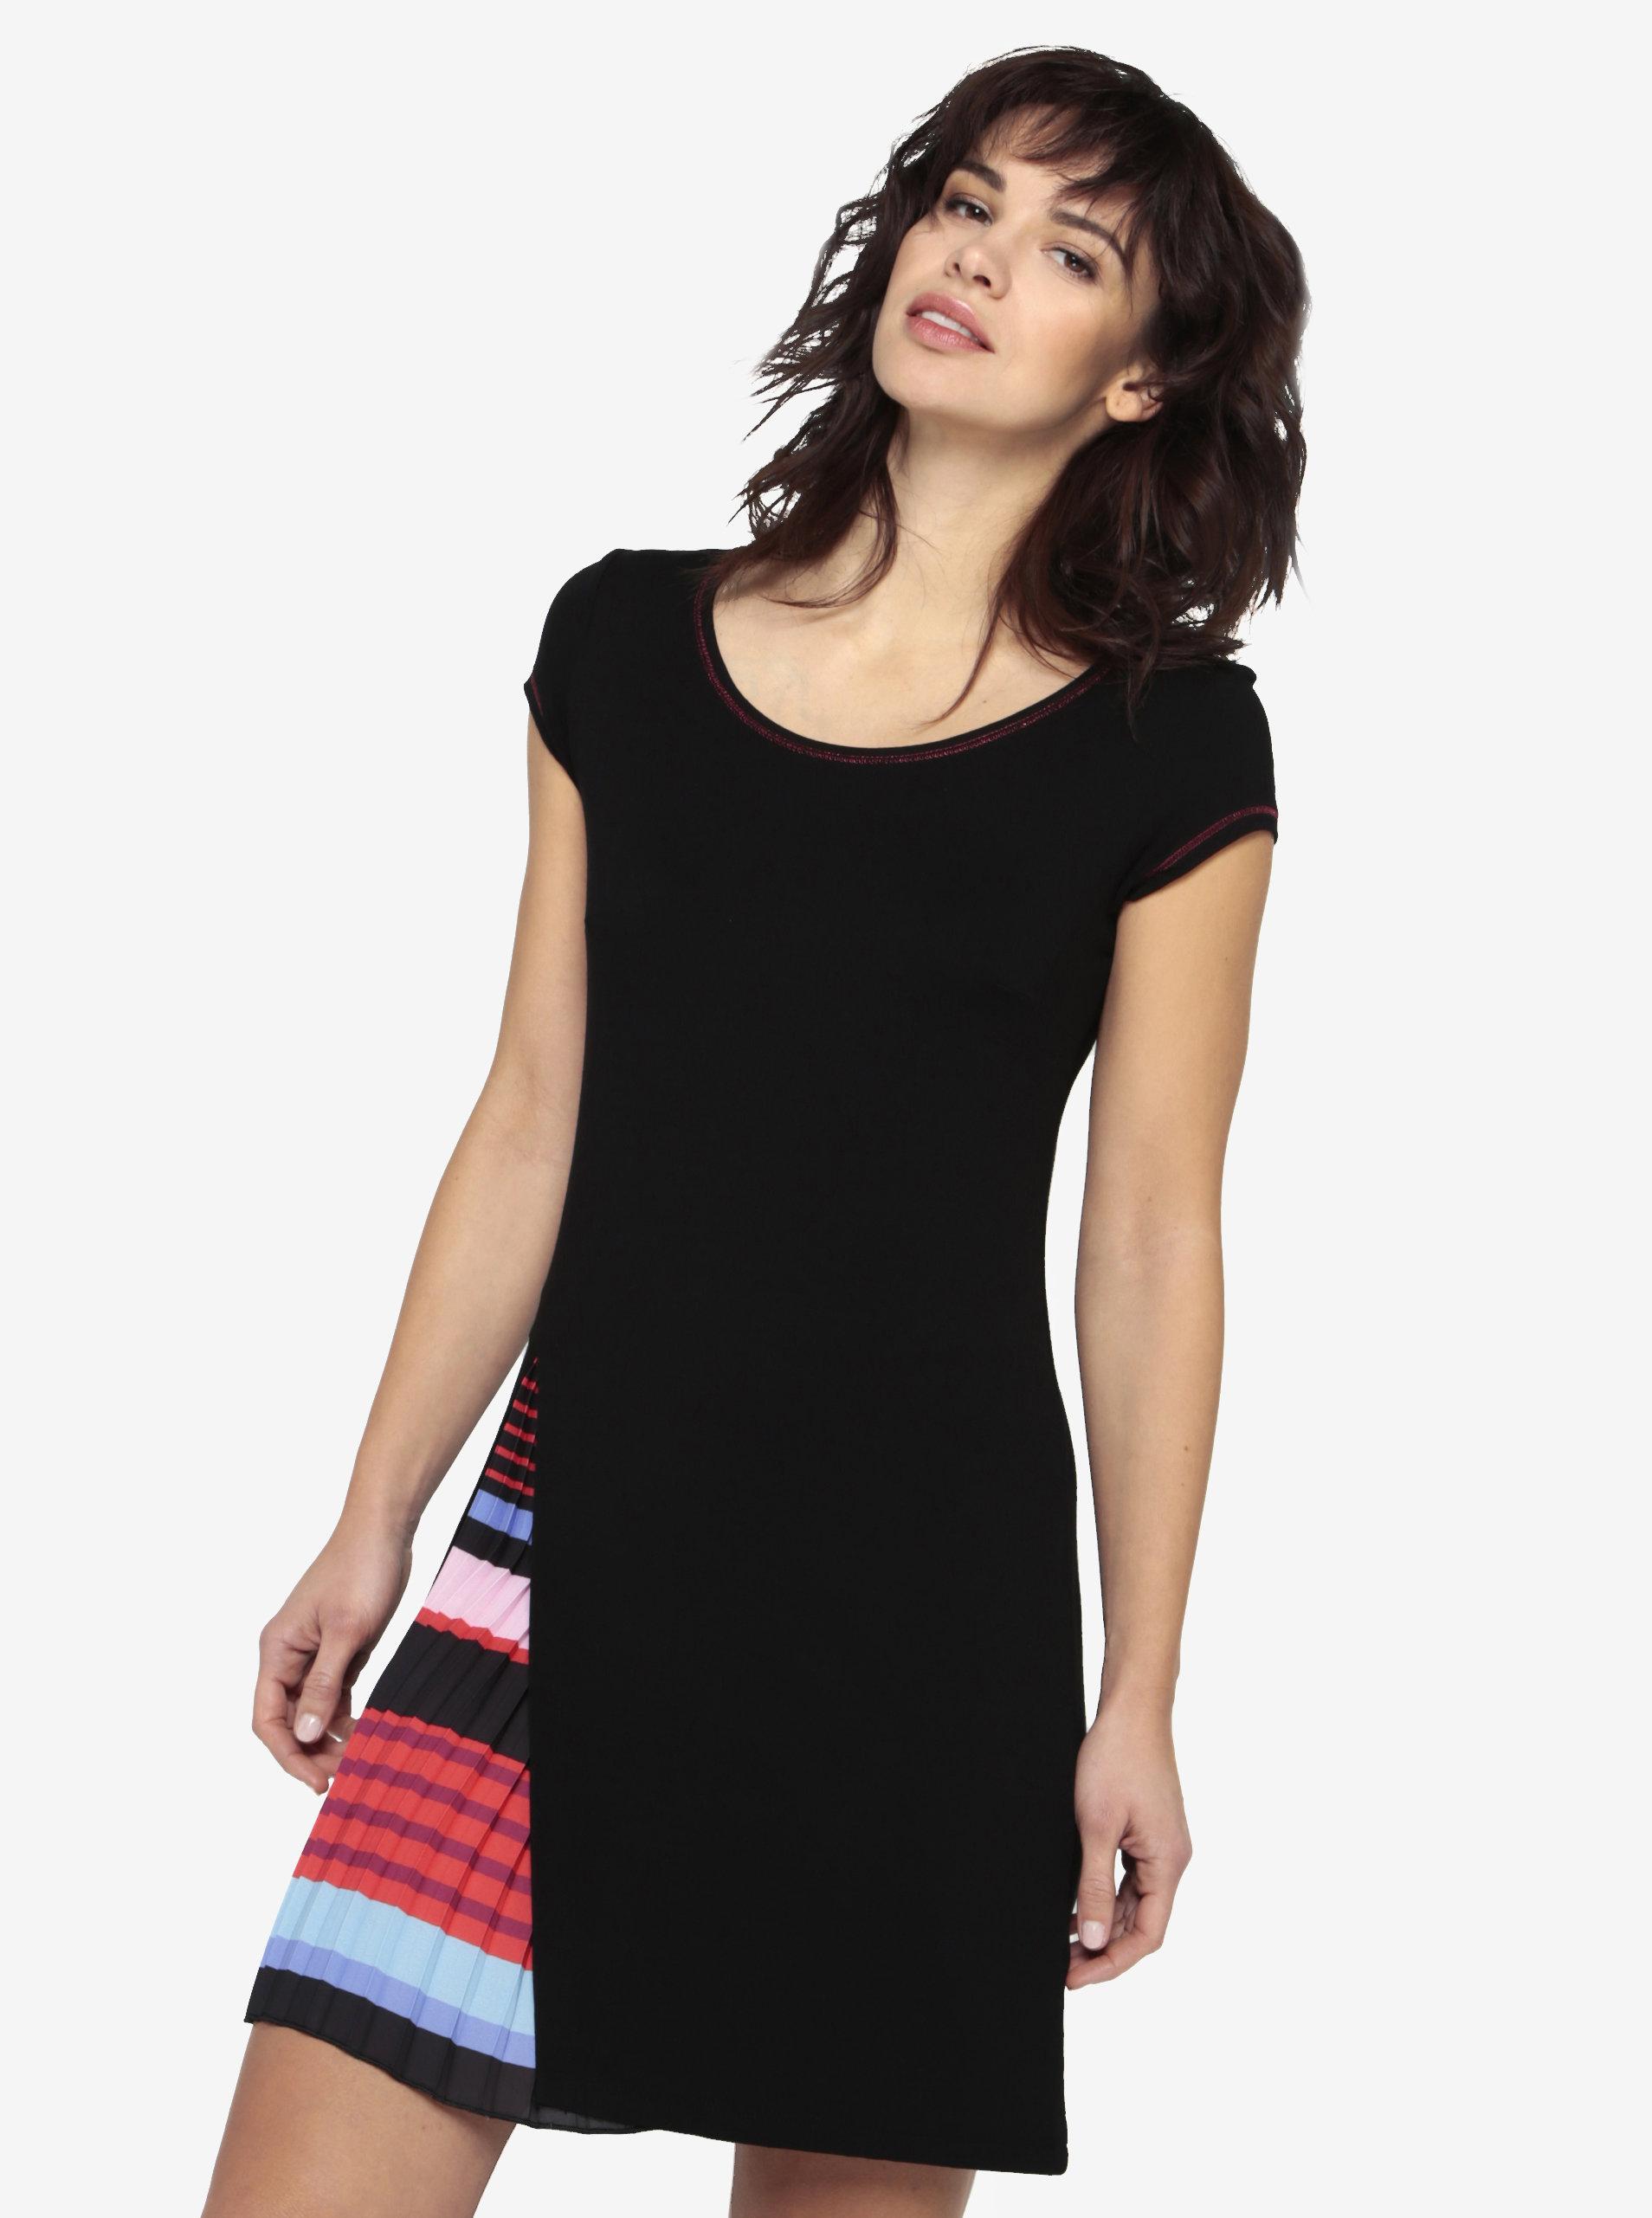 e1fca30d0ba3 Čierne šaty s plisovaným detailom Desigual Evaristo ...